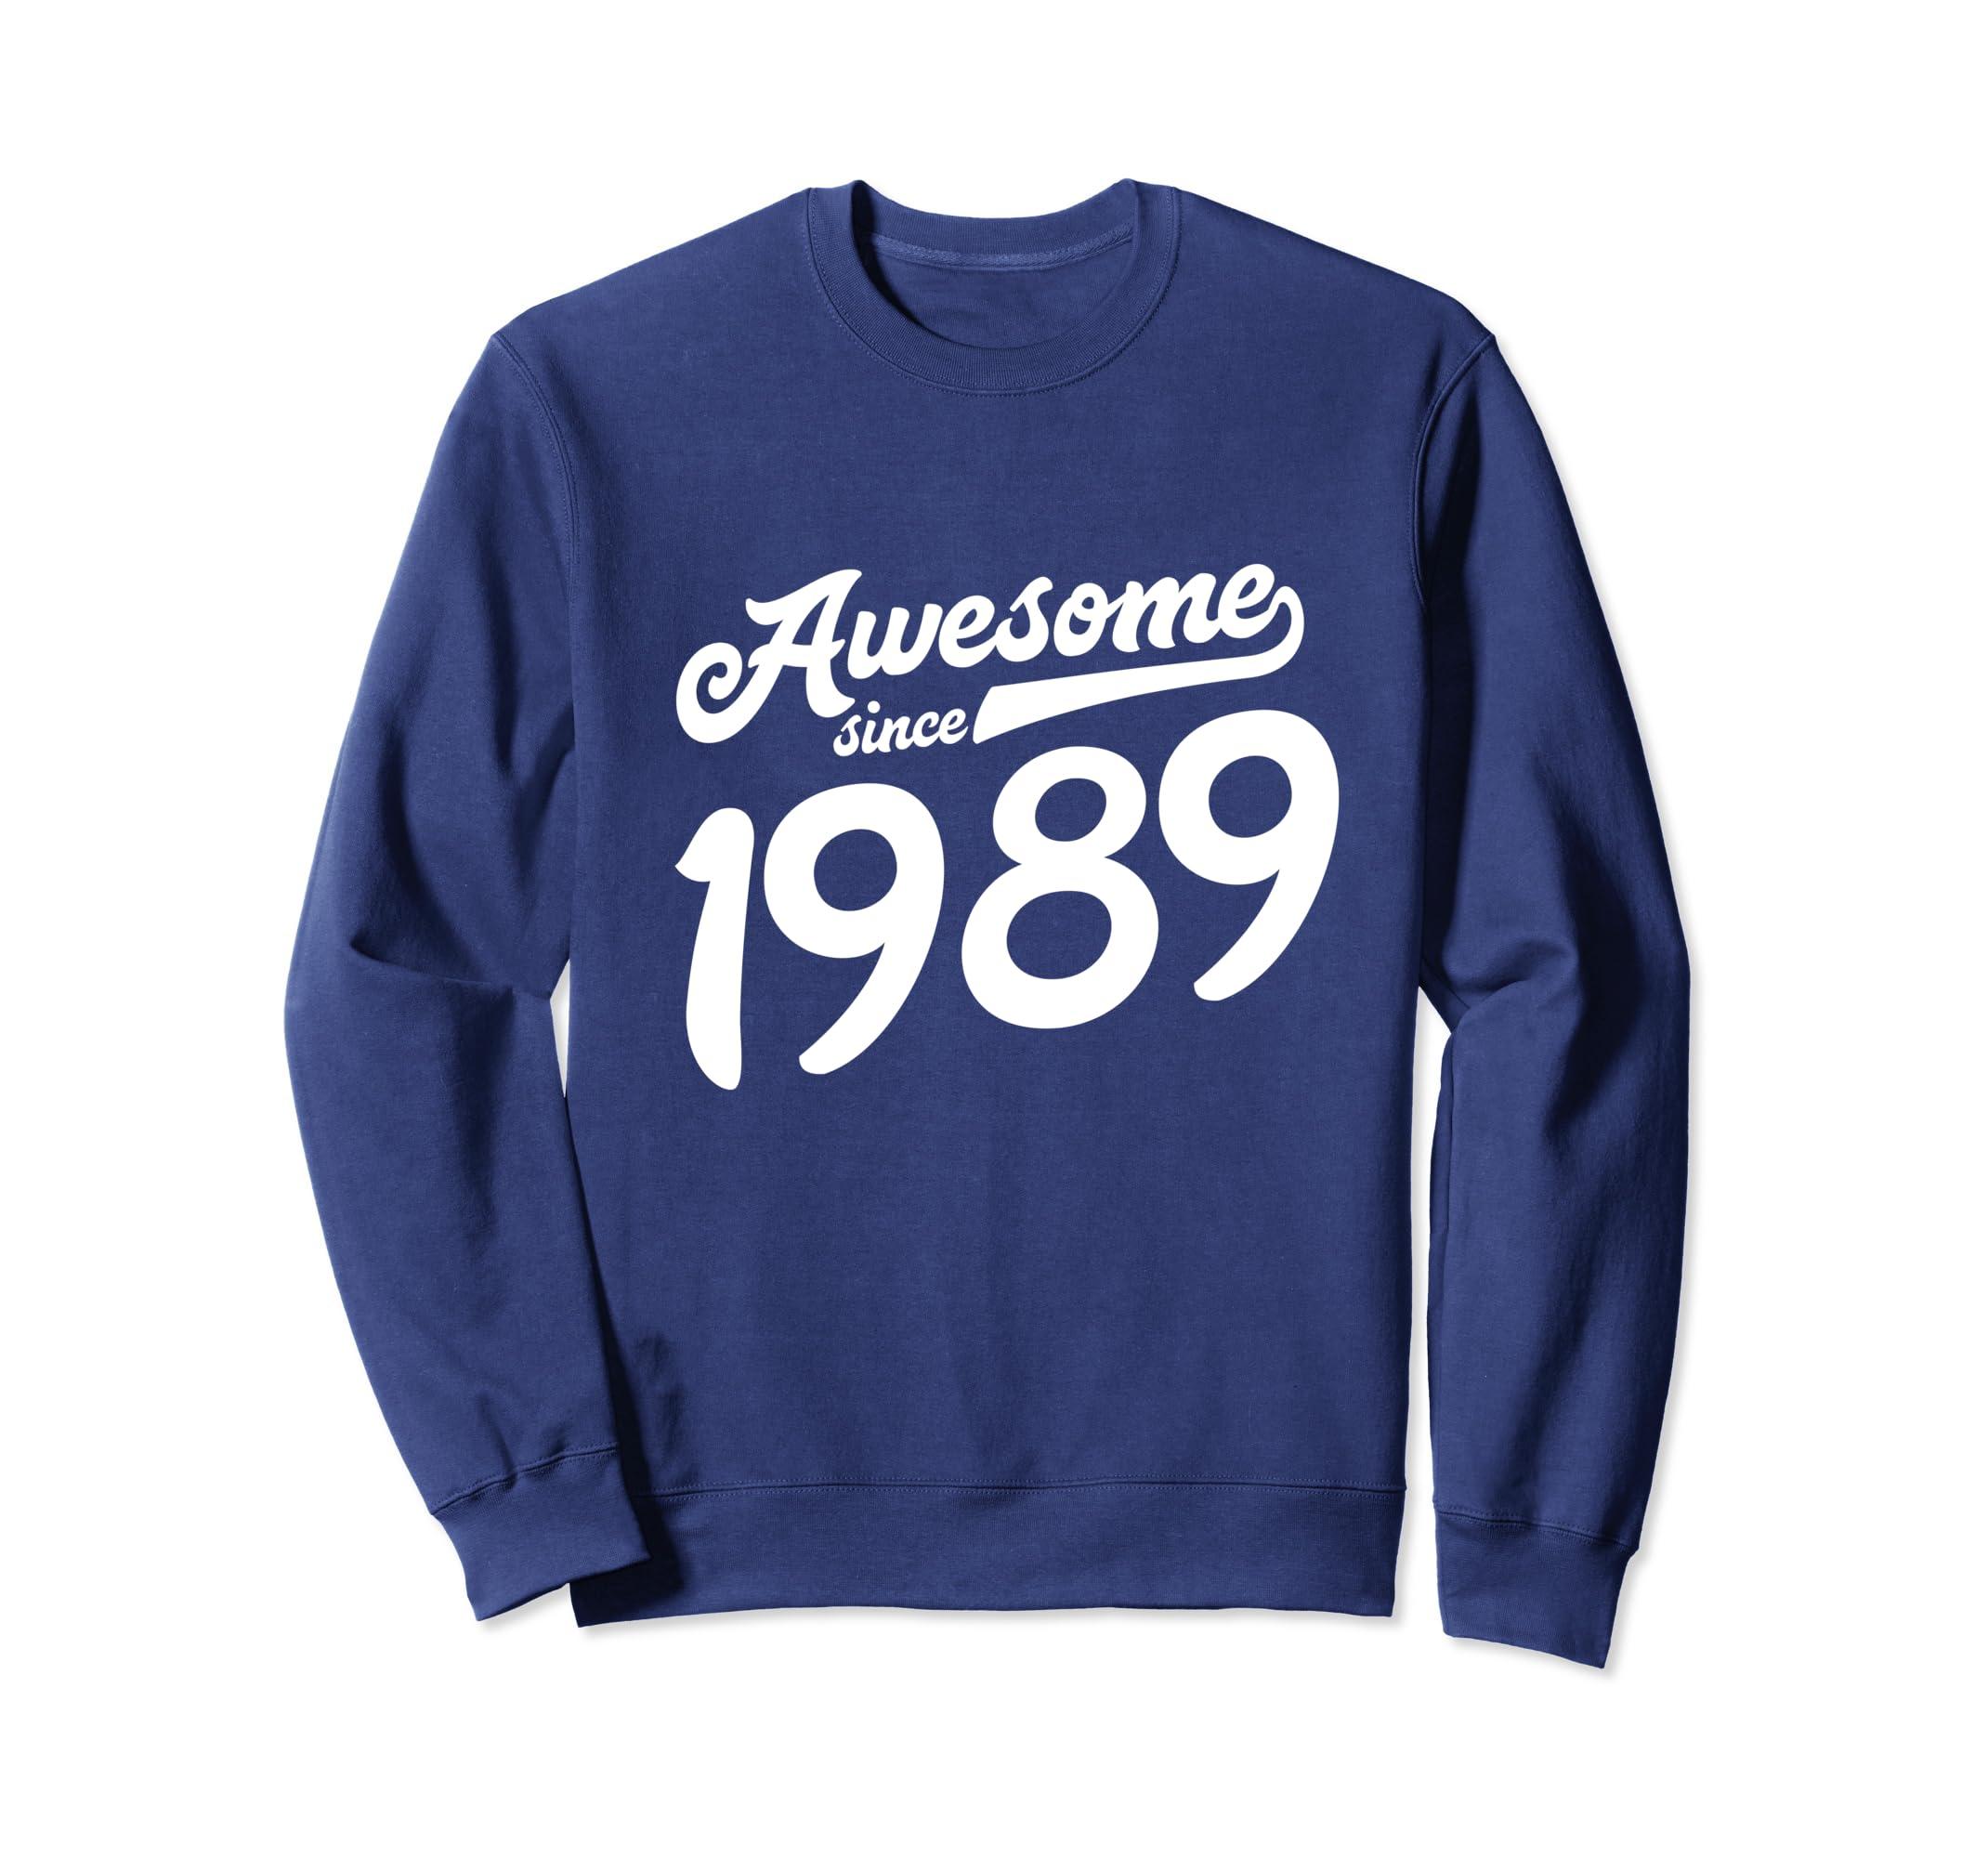 Amazon 30th Birthday Sweatshirt For Son Gifts 30 Year Old Men Clothing